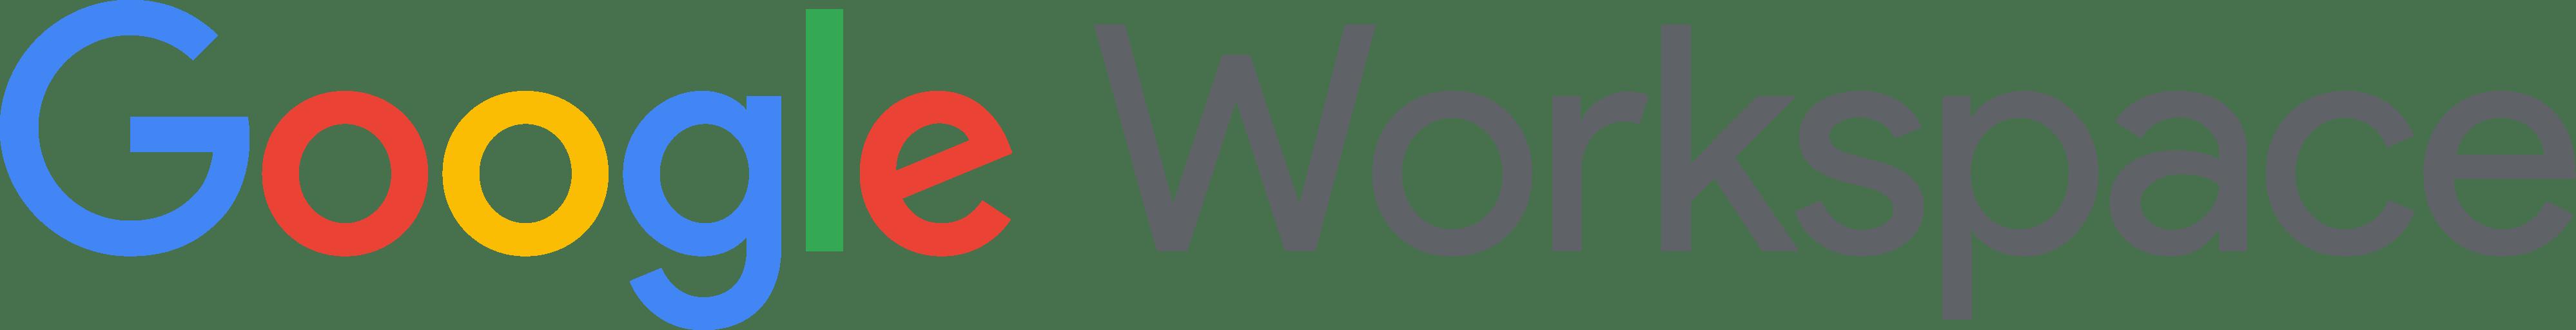 Google Workspace:Logo